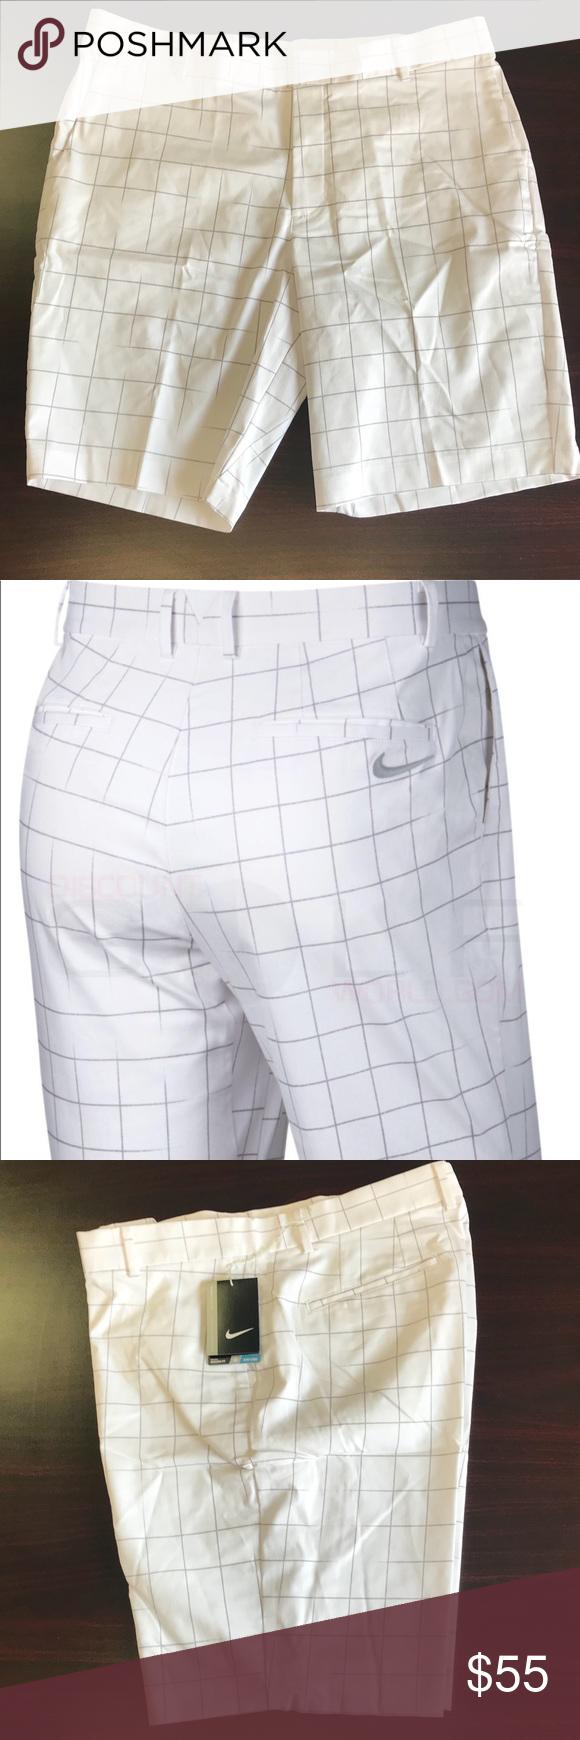 9d0707480e582 Nike Flex Slim Print Men s Golf Shorts 854991-100 NWT  90 Nike Flex Slim  Print